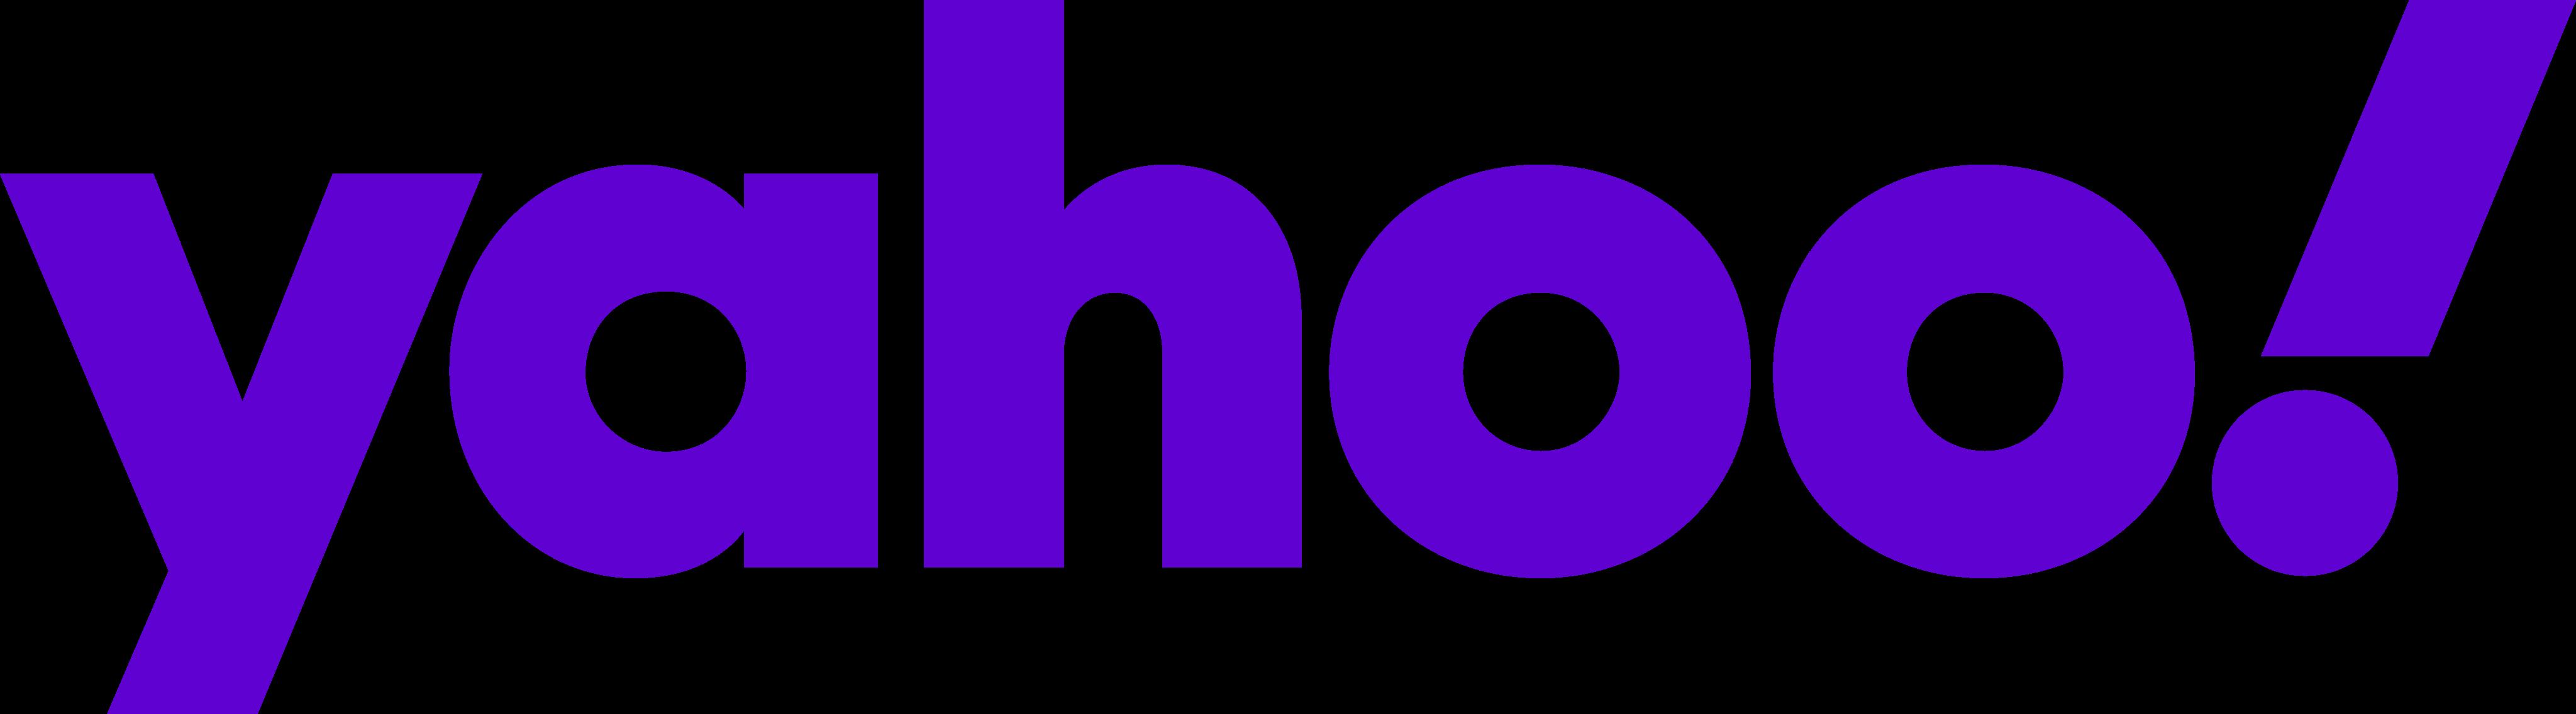 yahoo logo - Yahoo! Logo